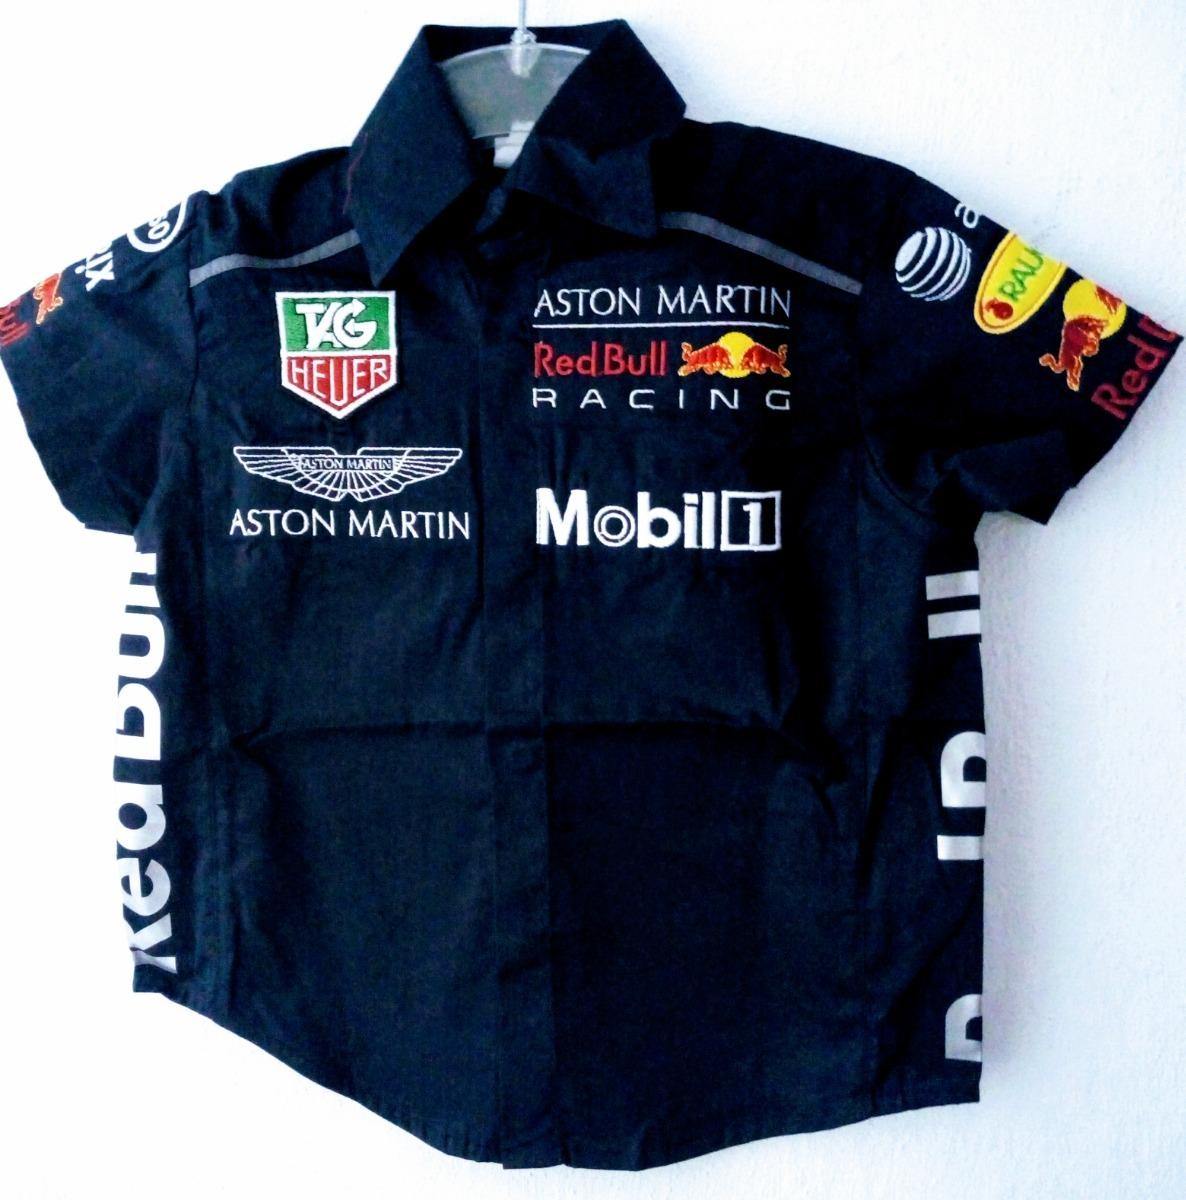 Camisa Red Bull Racing Mobil Esso Aston Martin Niño -   450.00 en ... dc44ad23b75